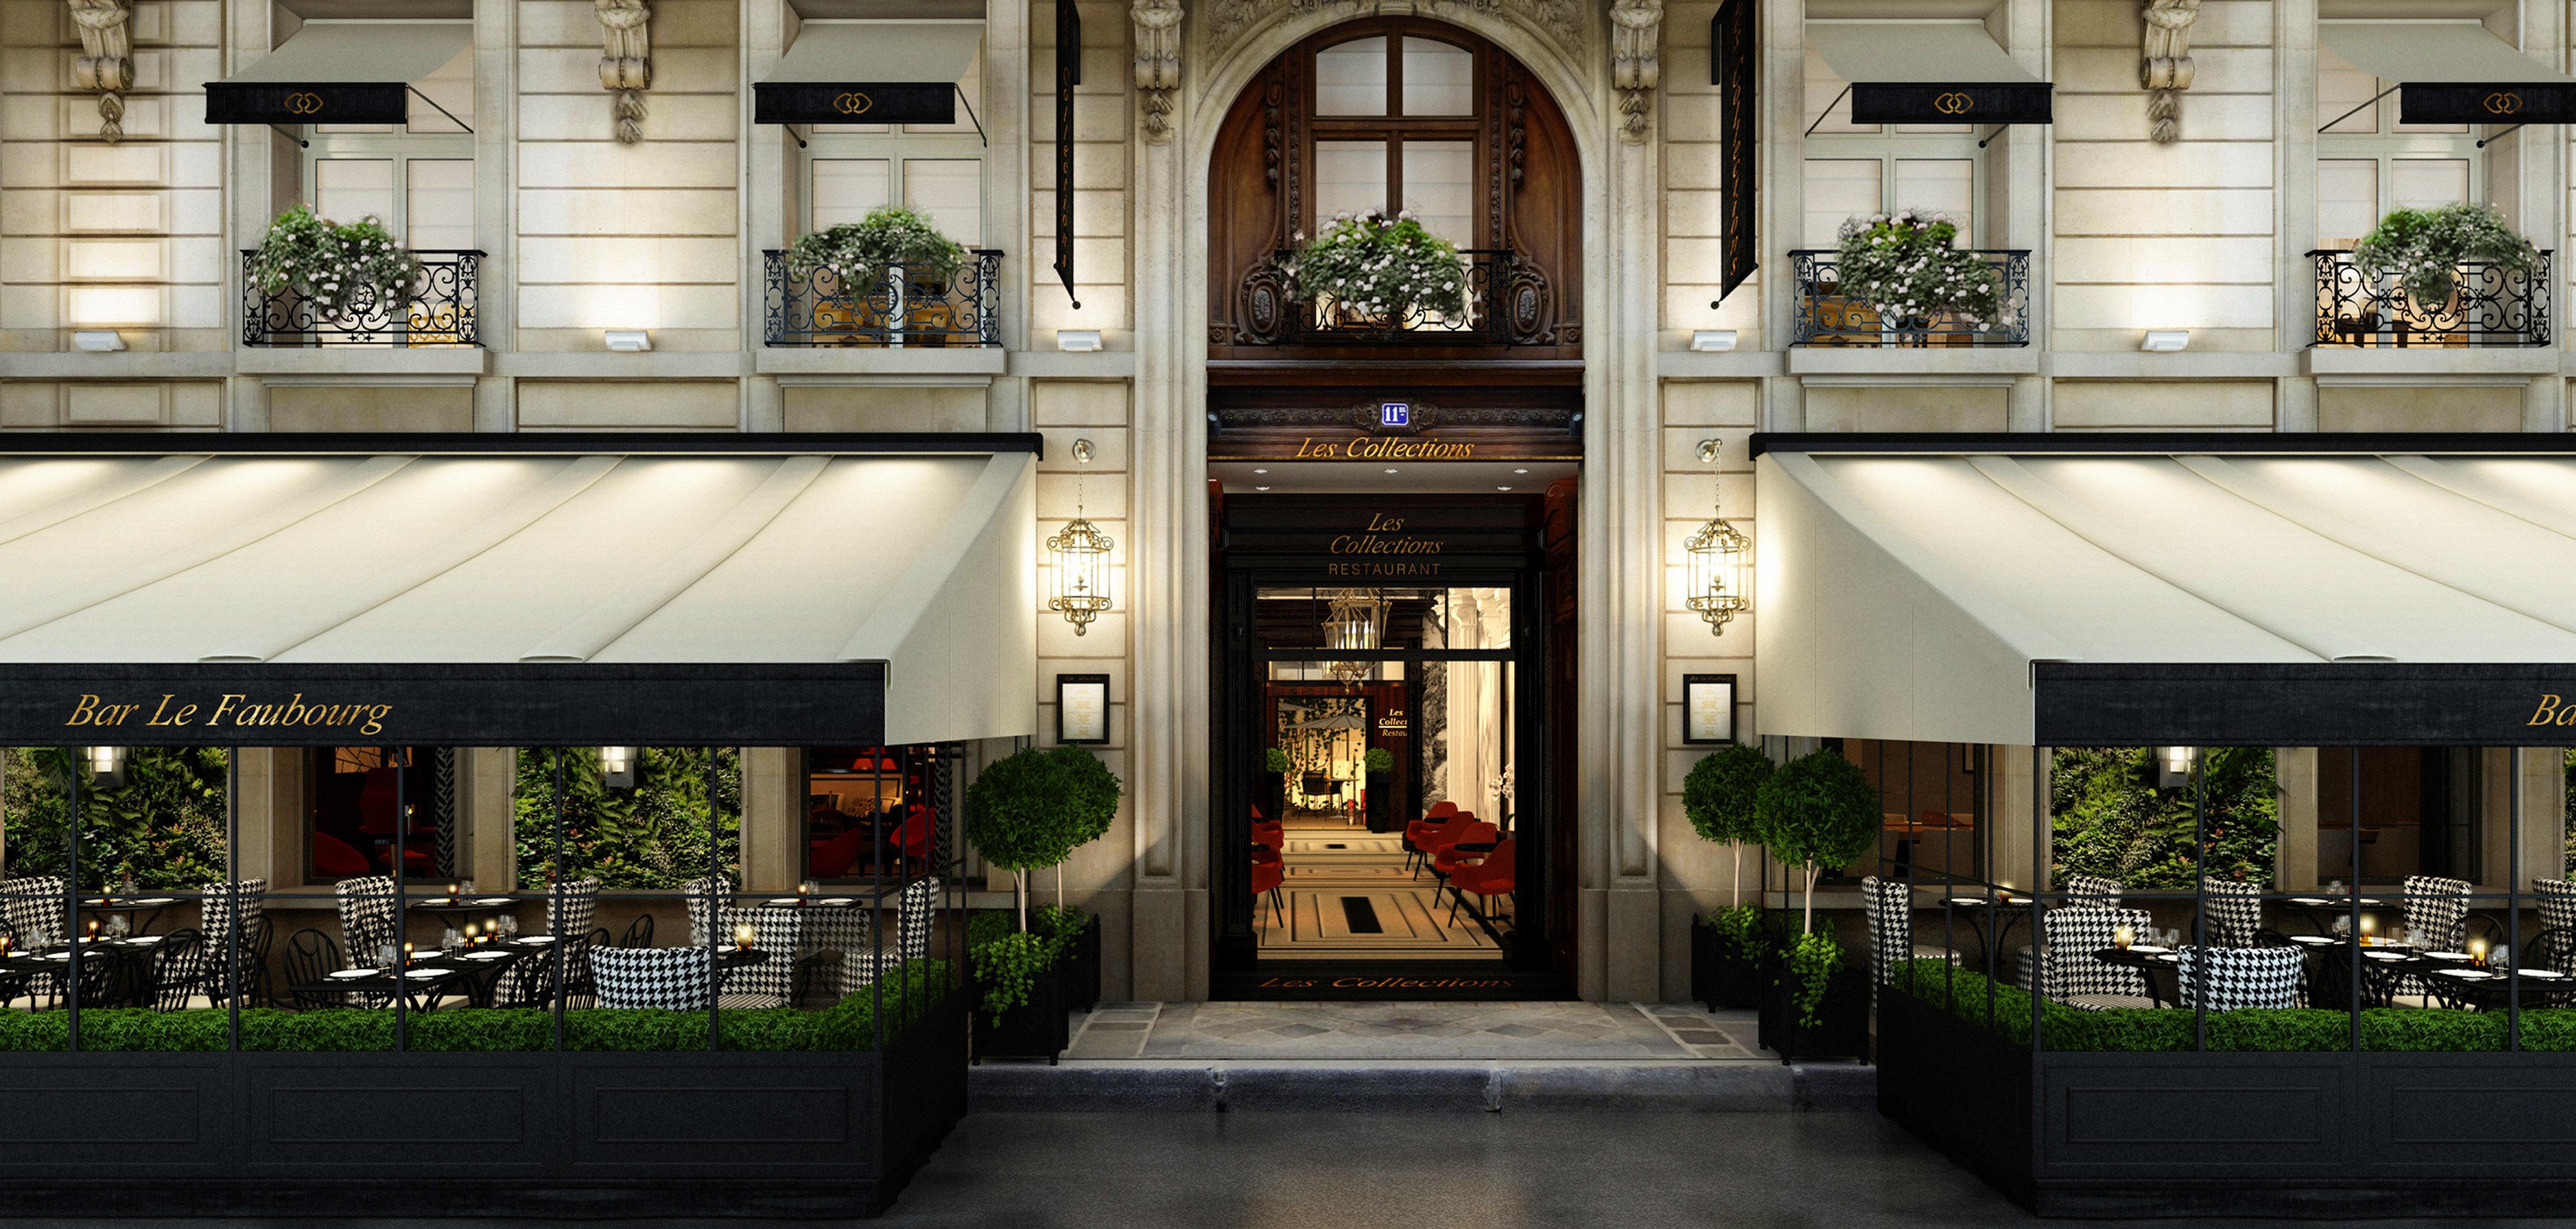 Elegant Exterior Luxury Modern Architecture restaurant lighting Lobby Courtyard stone